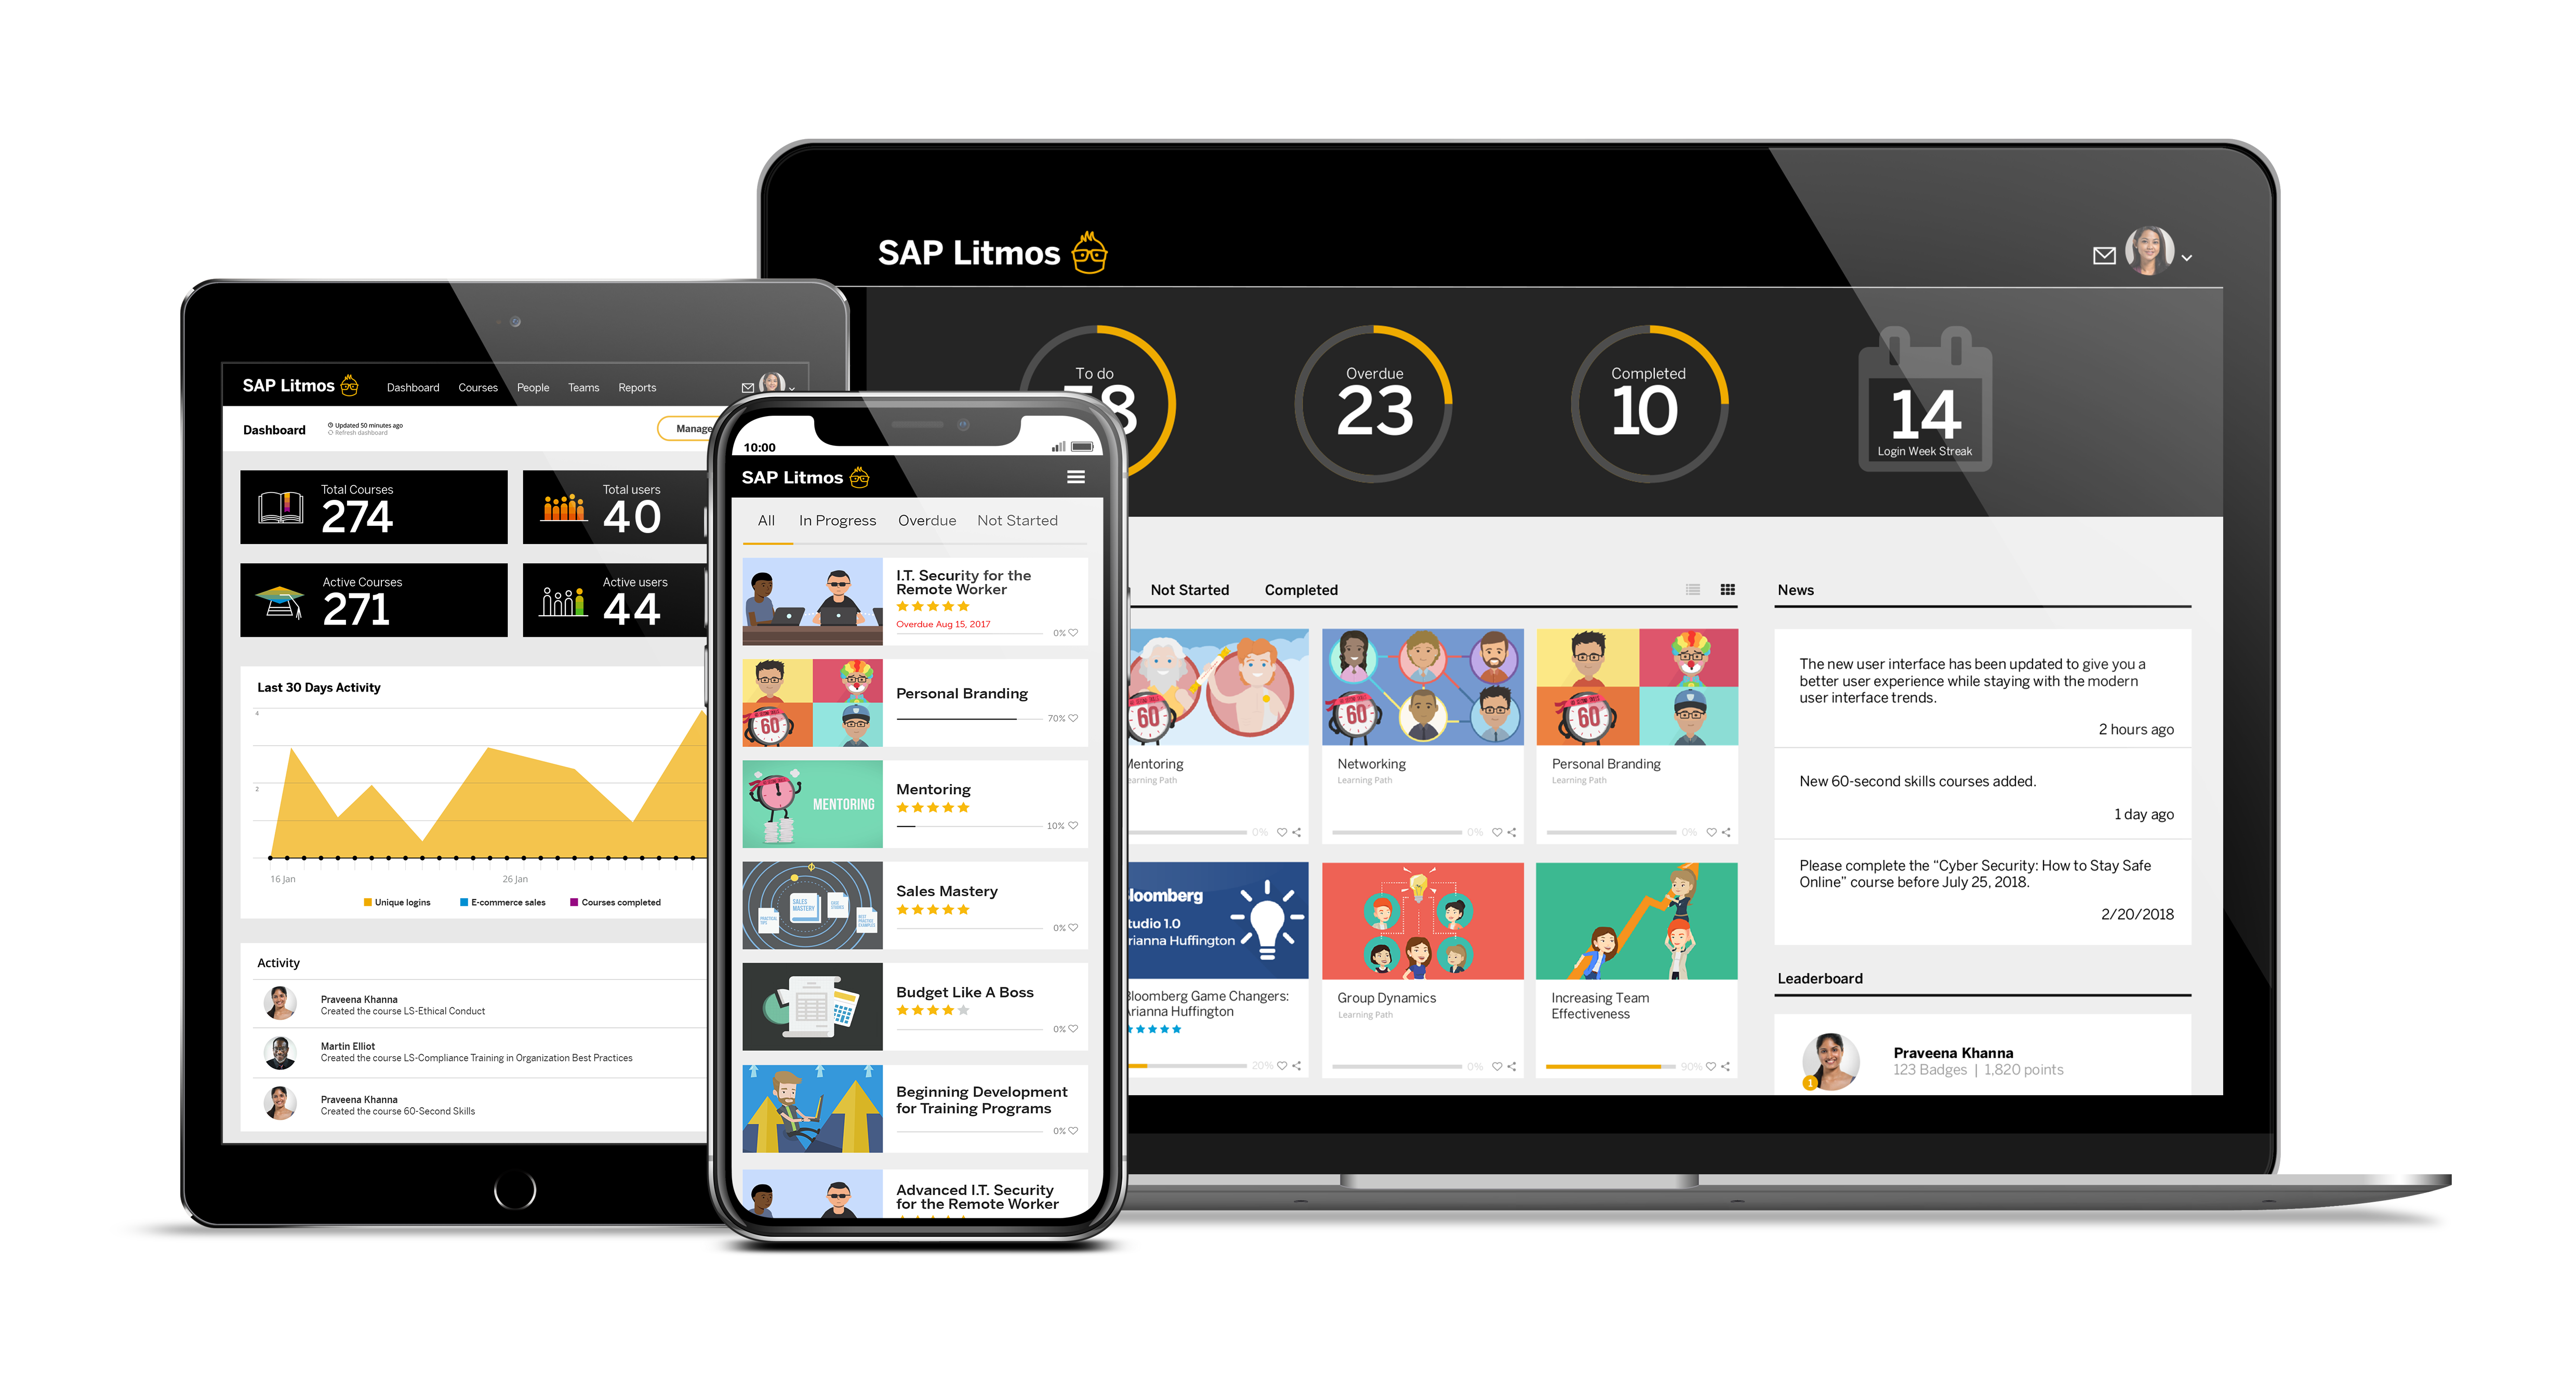 SAP Litmos | G2